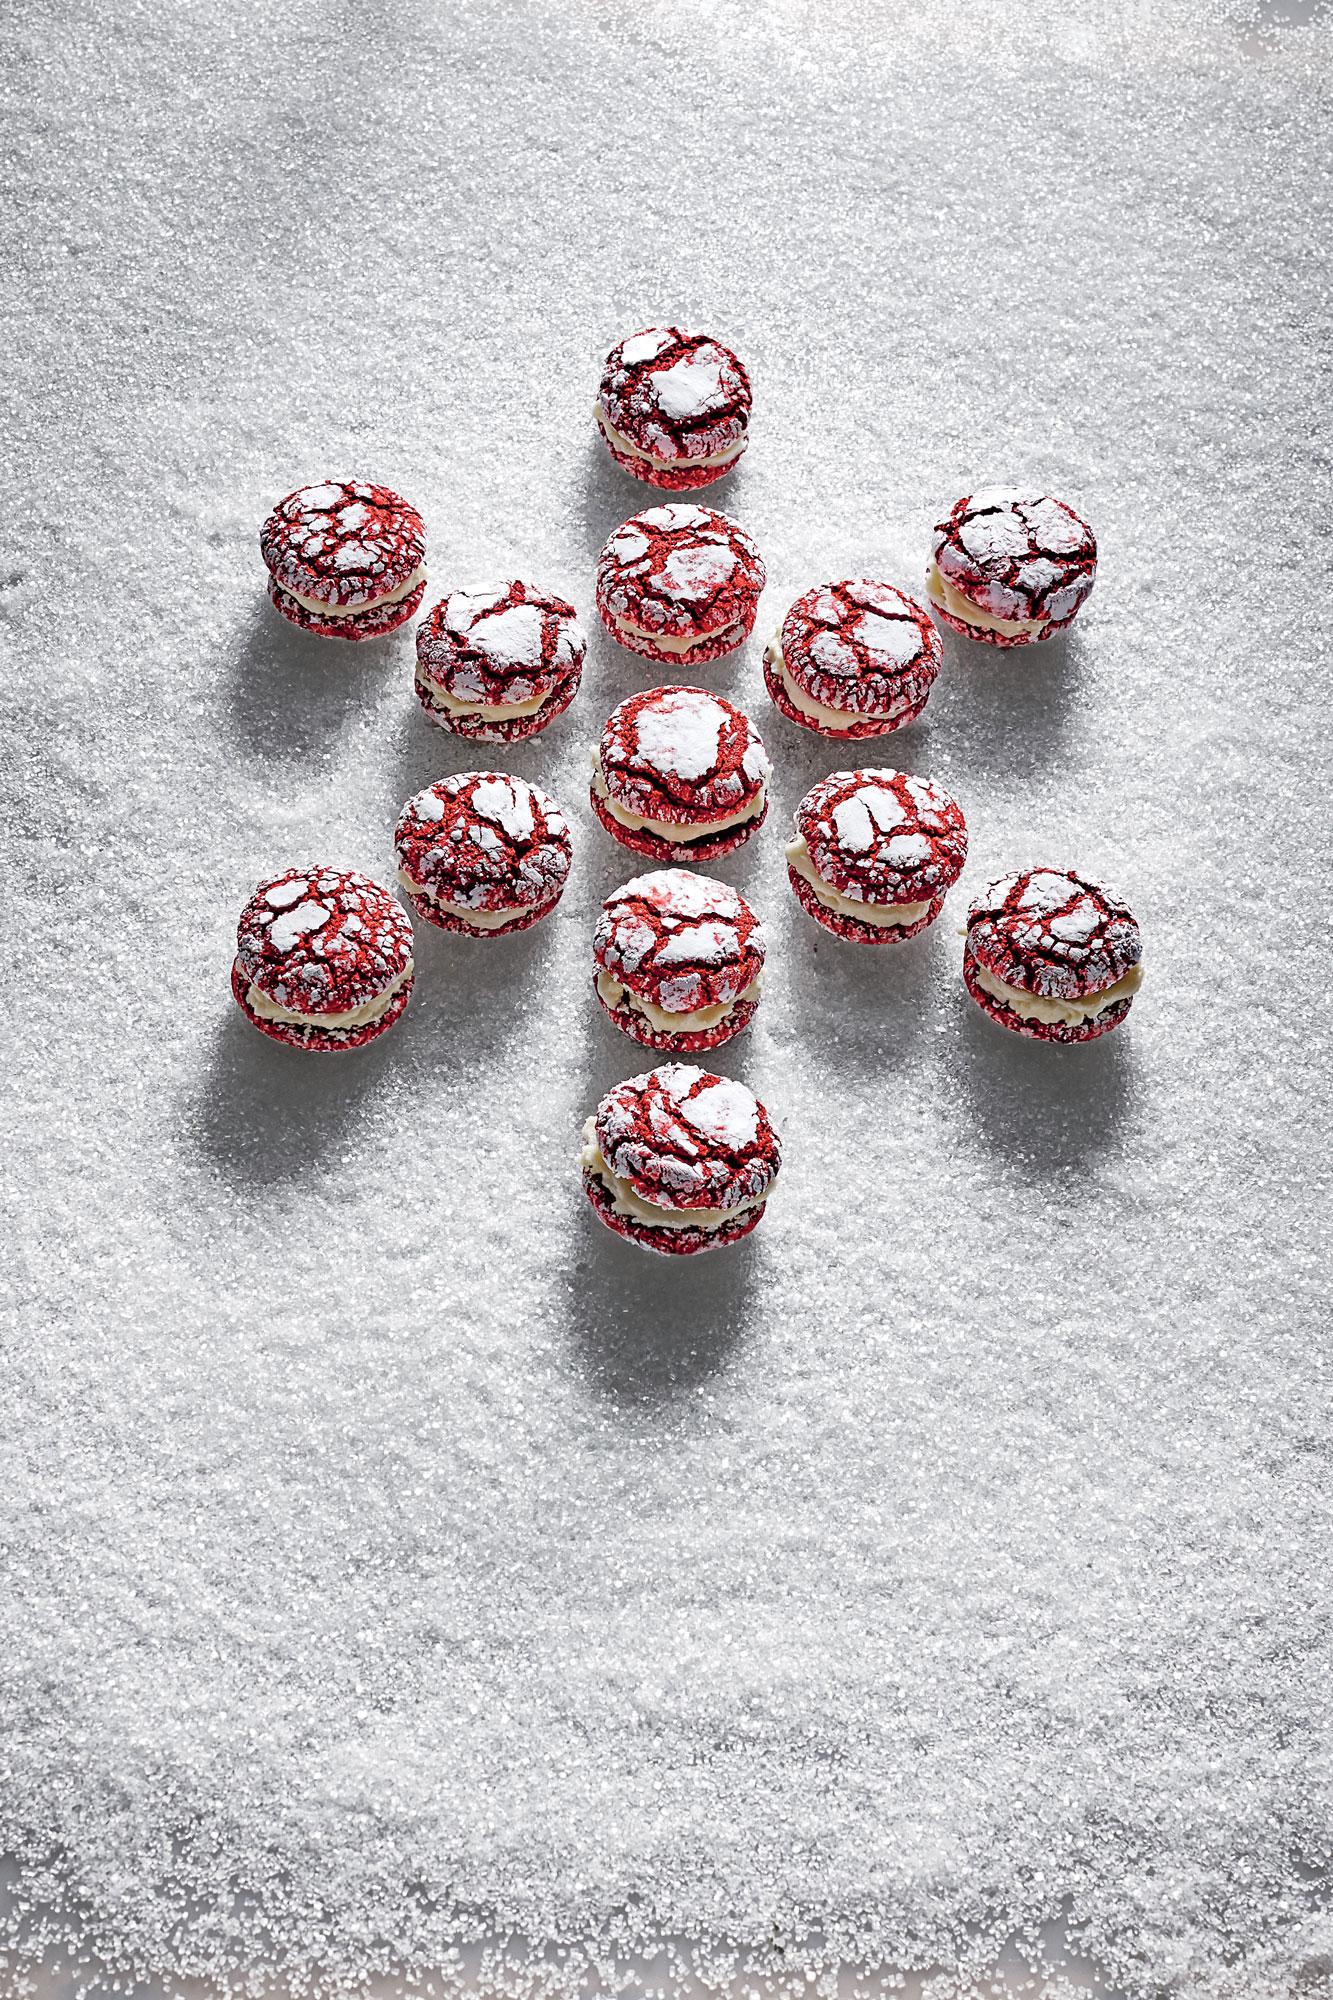 Red Velvet Crackle Sandwich Cookies image